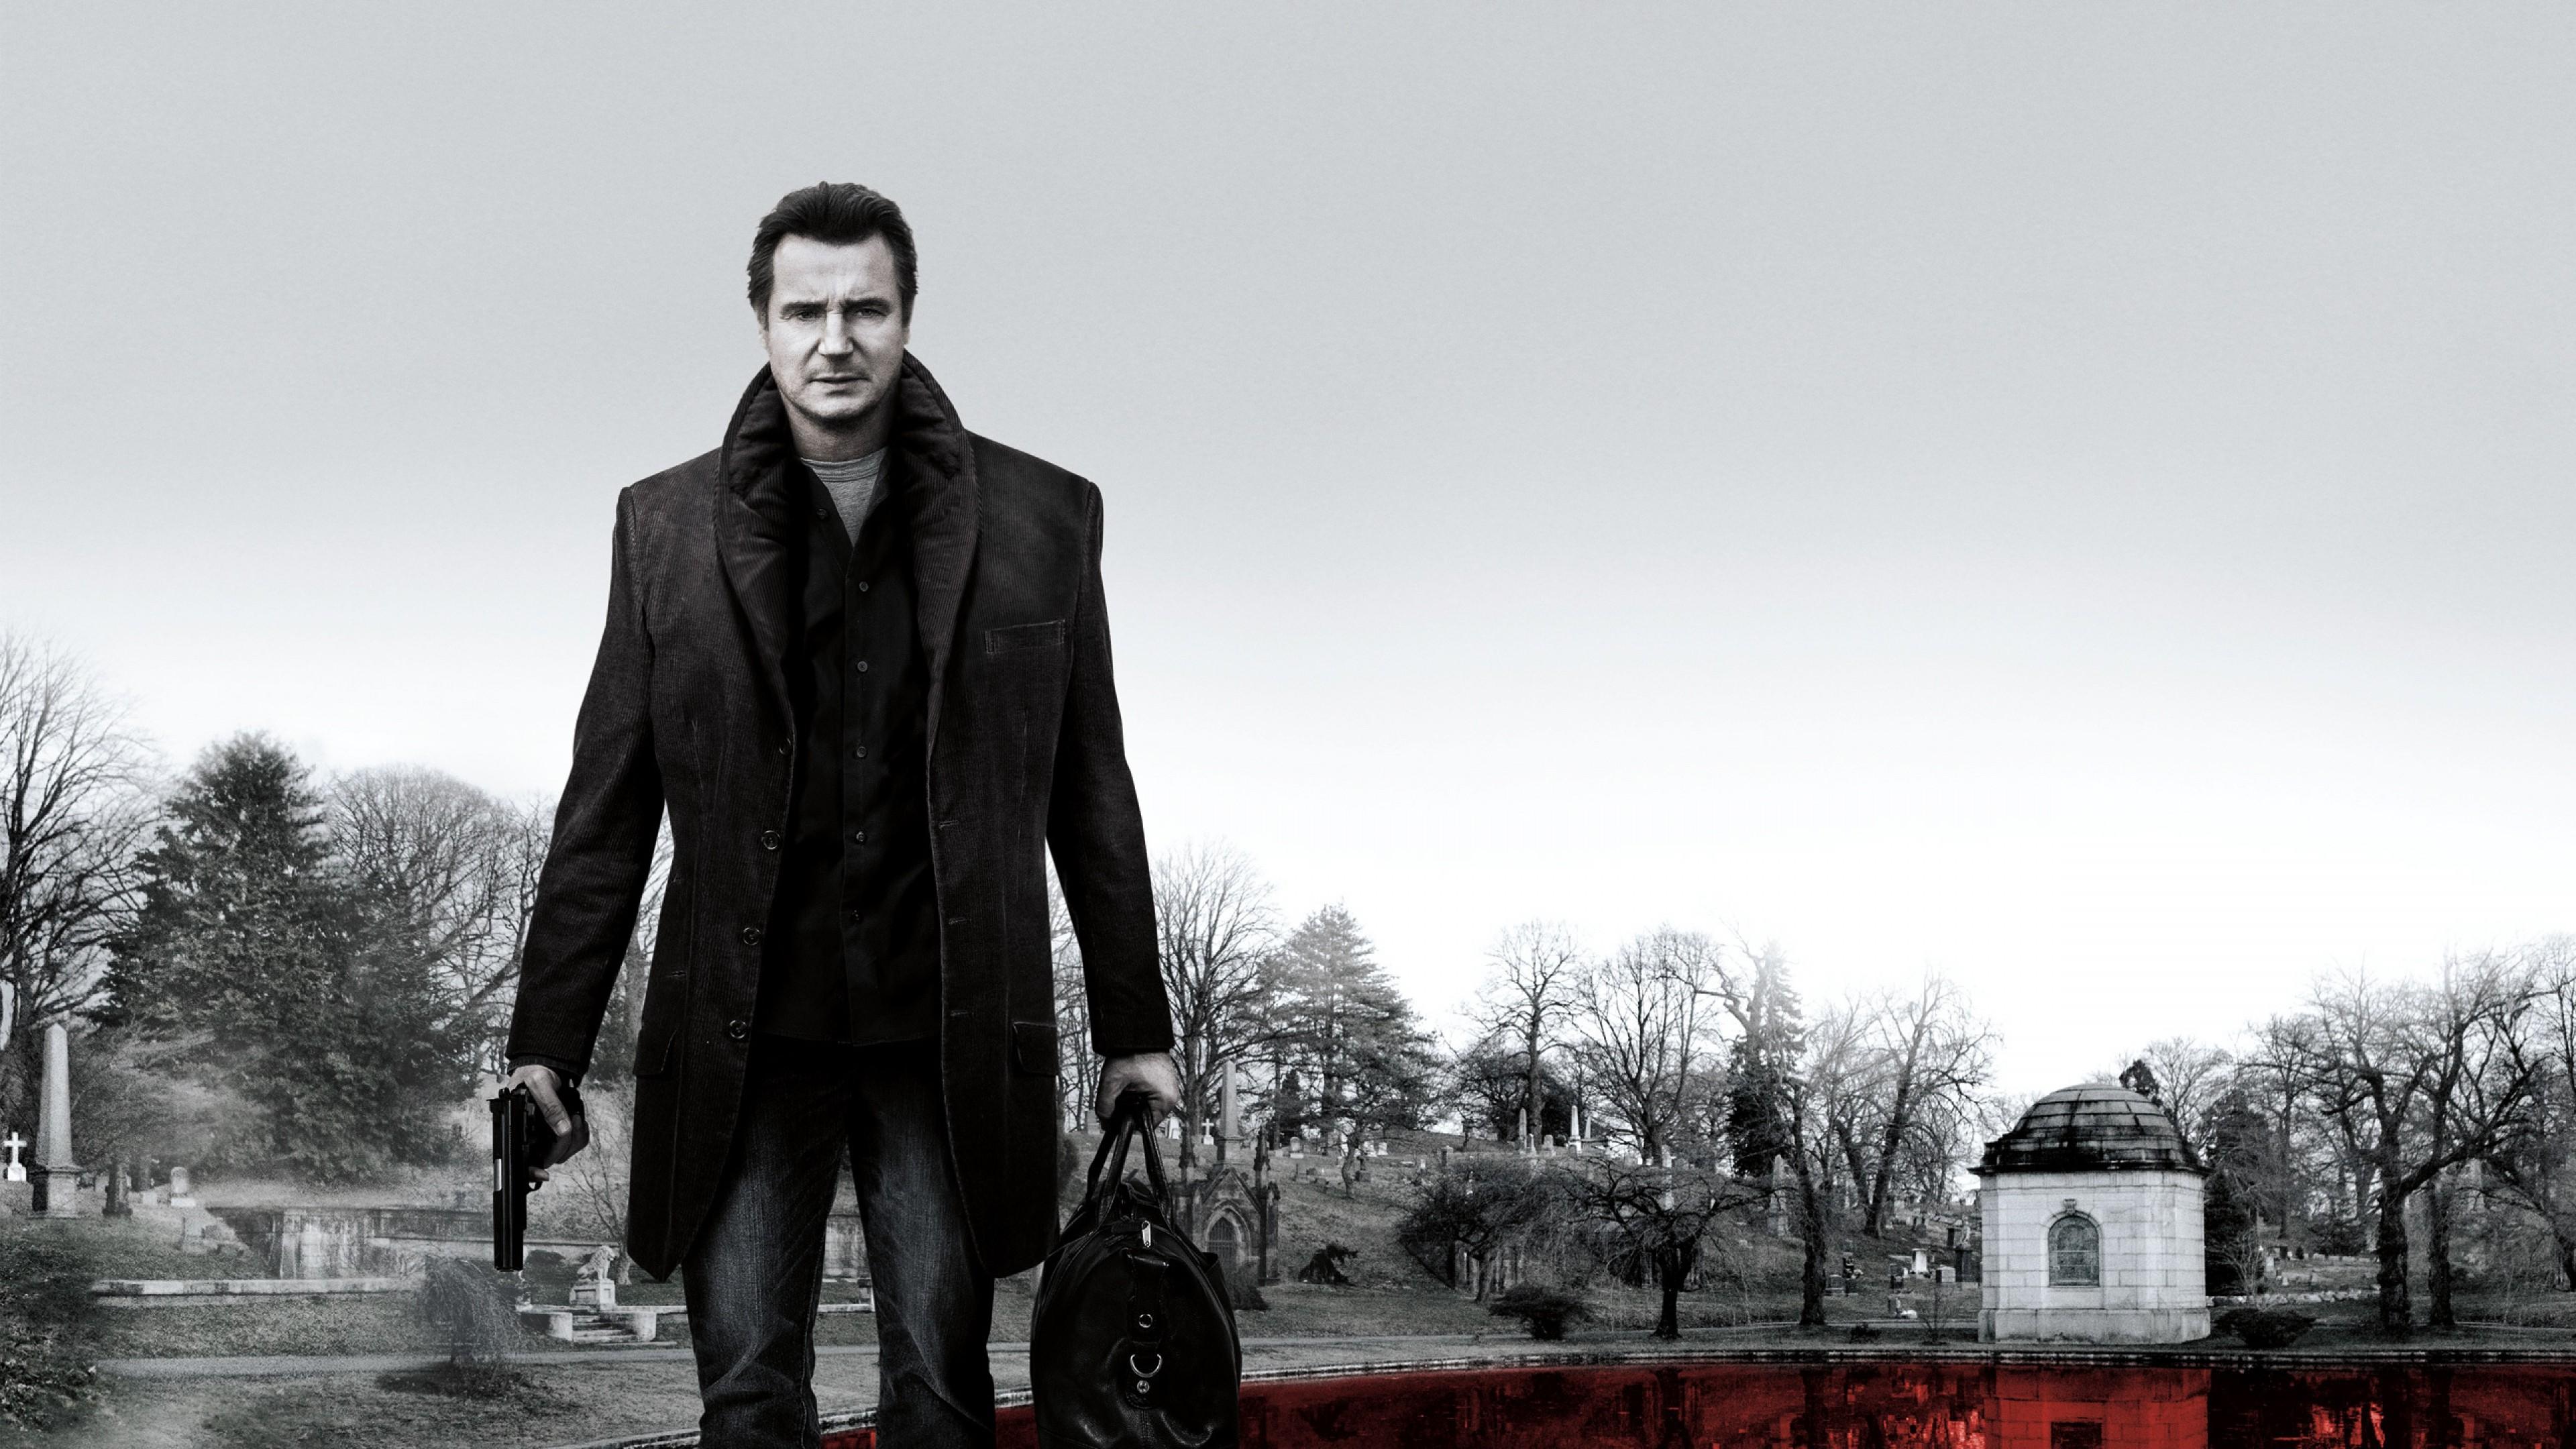 World's Top 10 Richest Actors in 2017, Liam Neeson